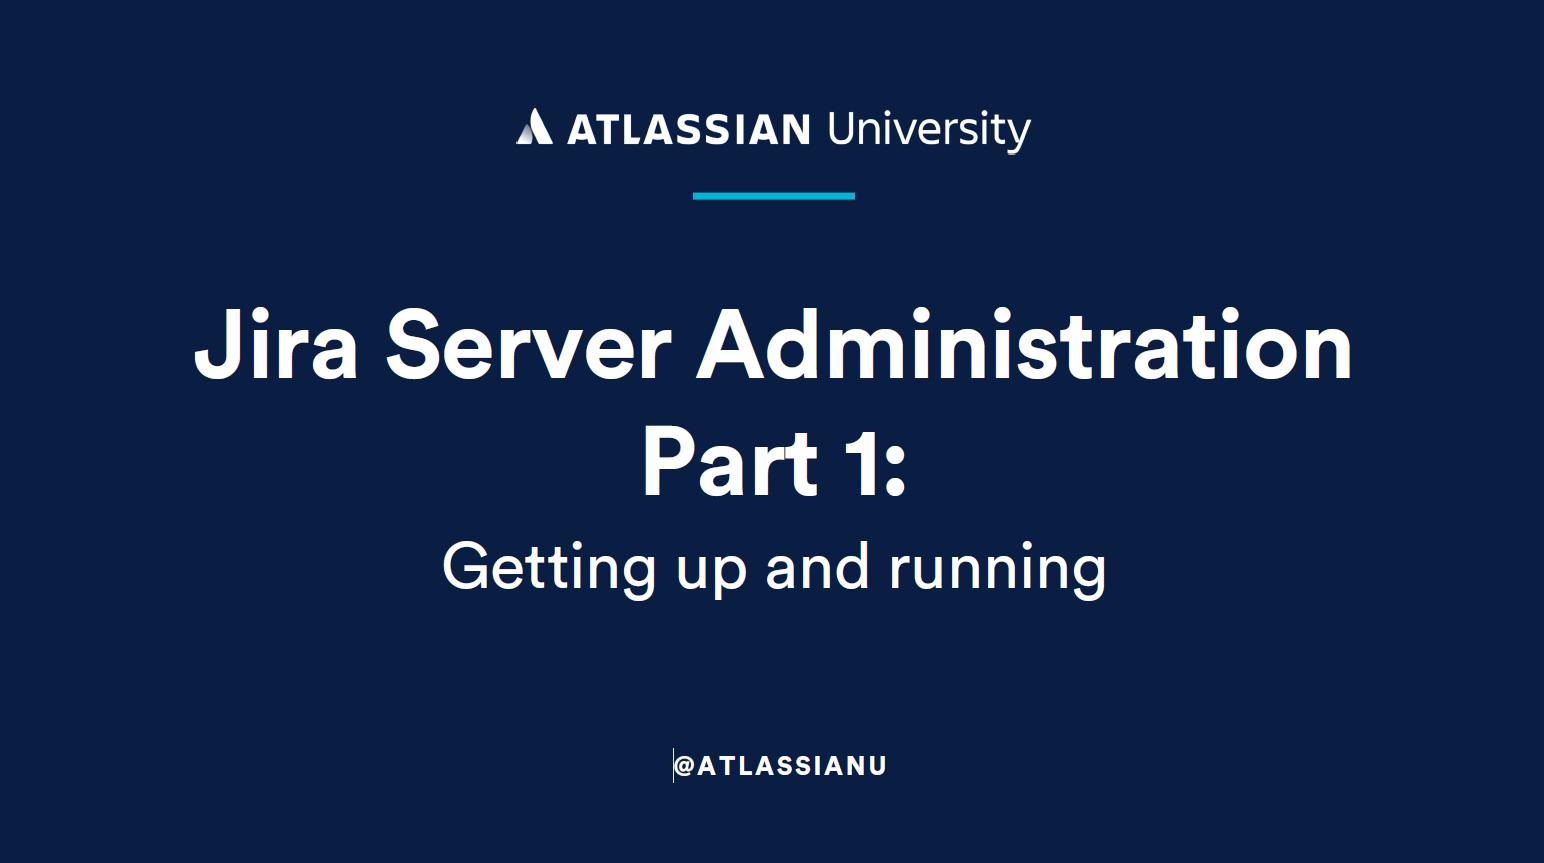 Jira Server Administration Part 1 (1)